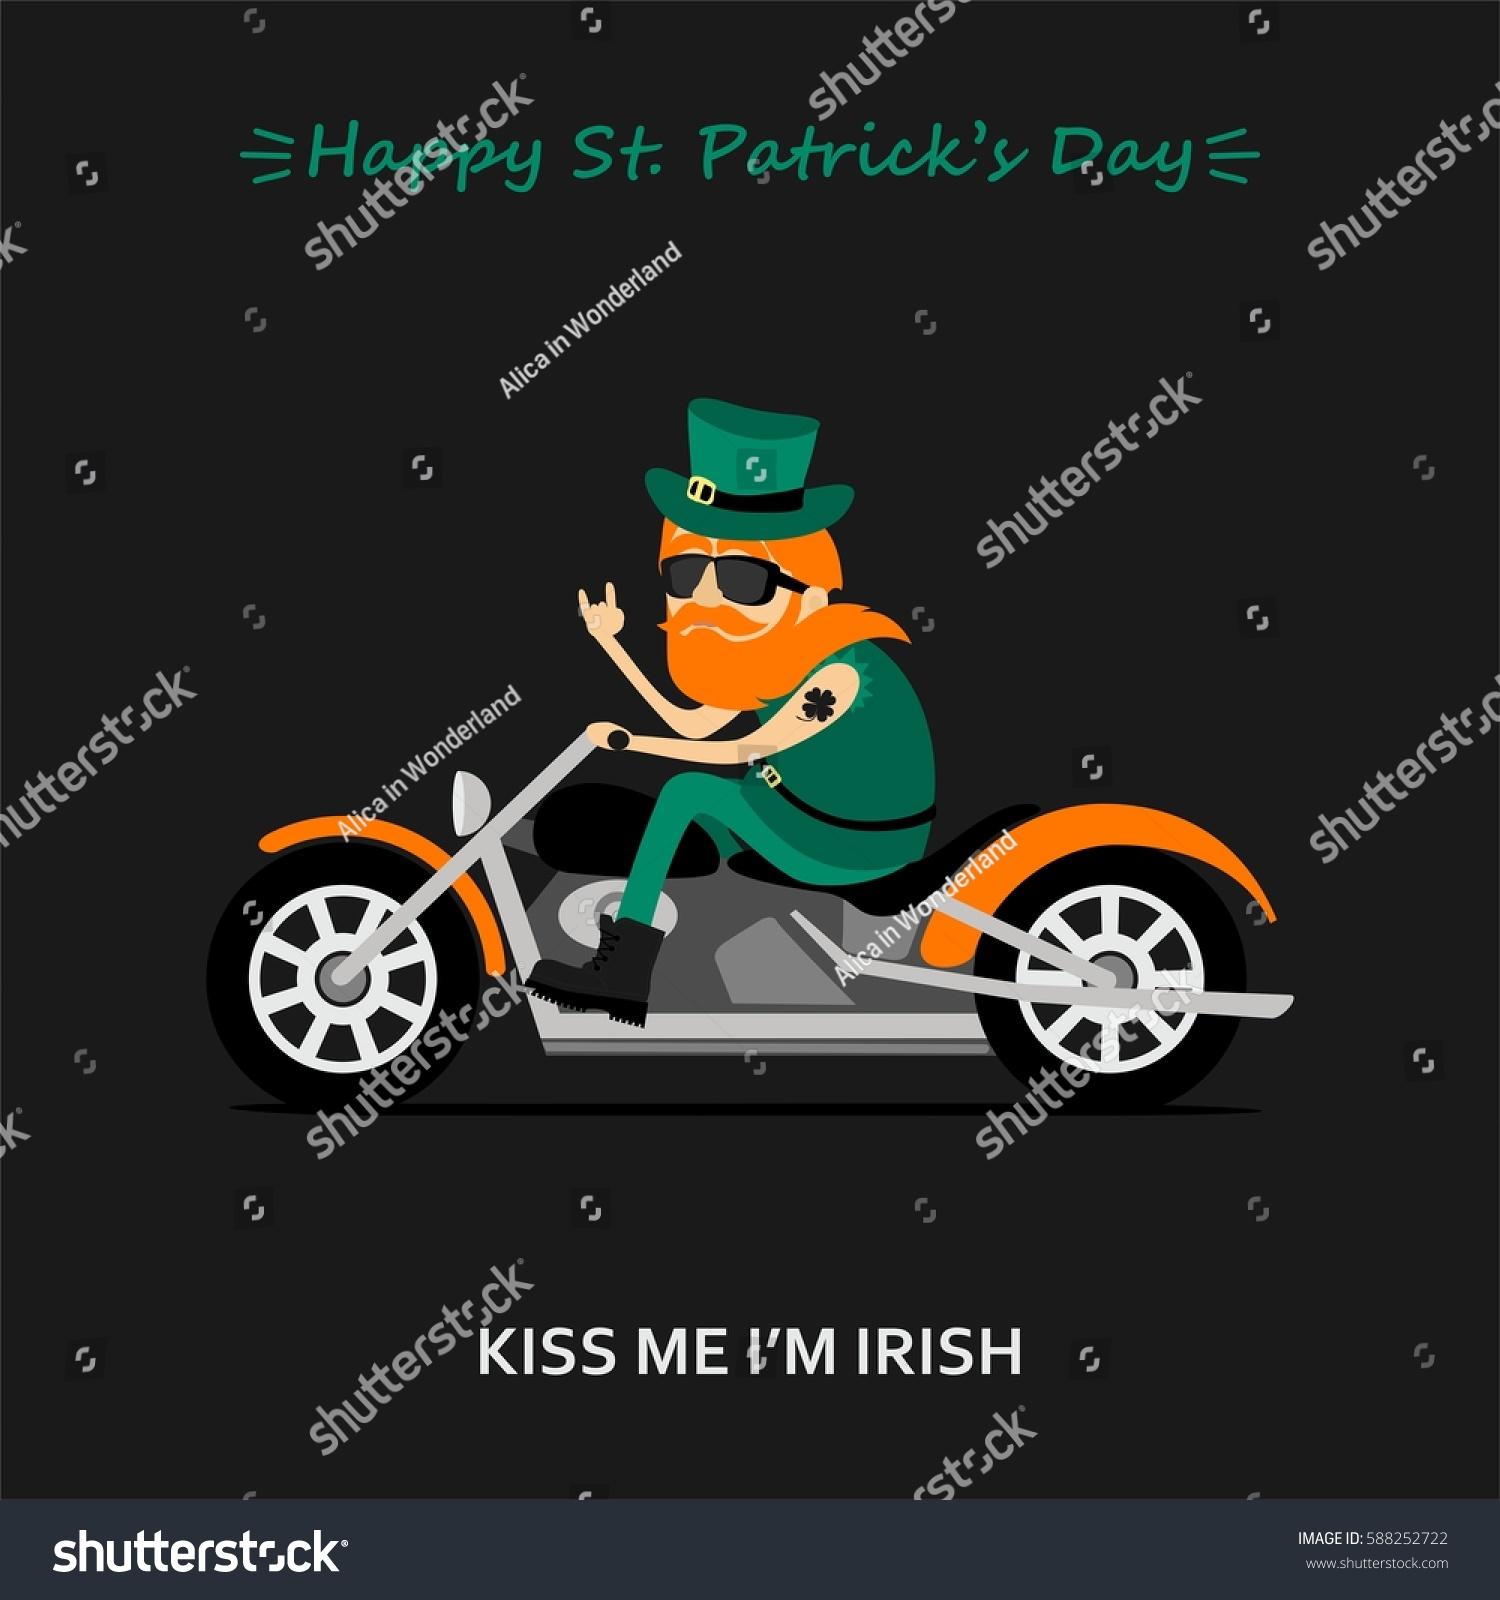 Iam A Rider Lambogini Song Download: St Patricks Day Greeting Card Banner Stock Vector